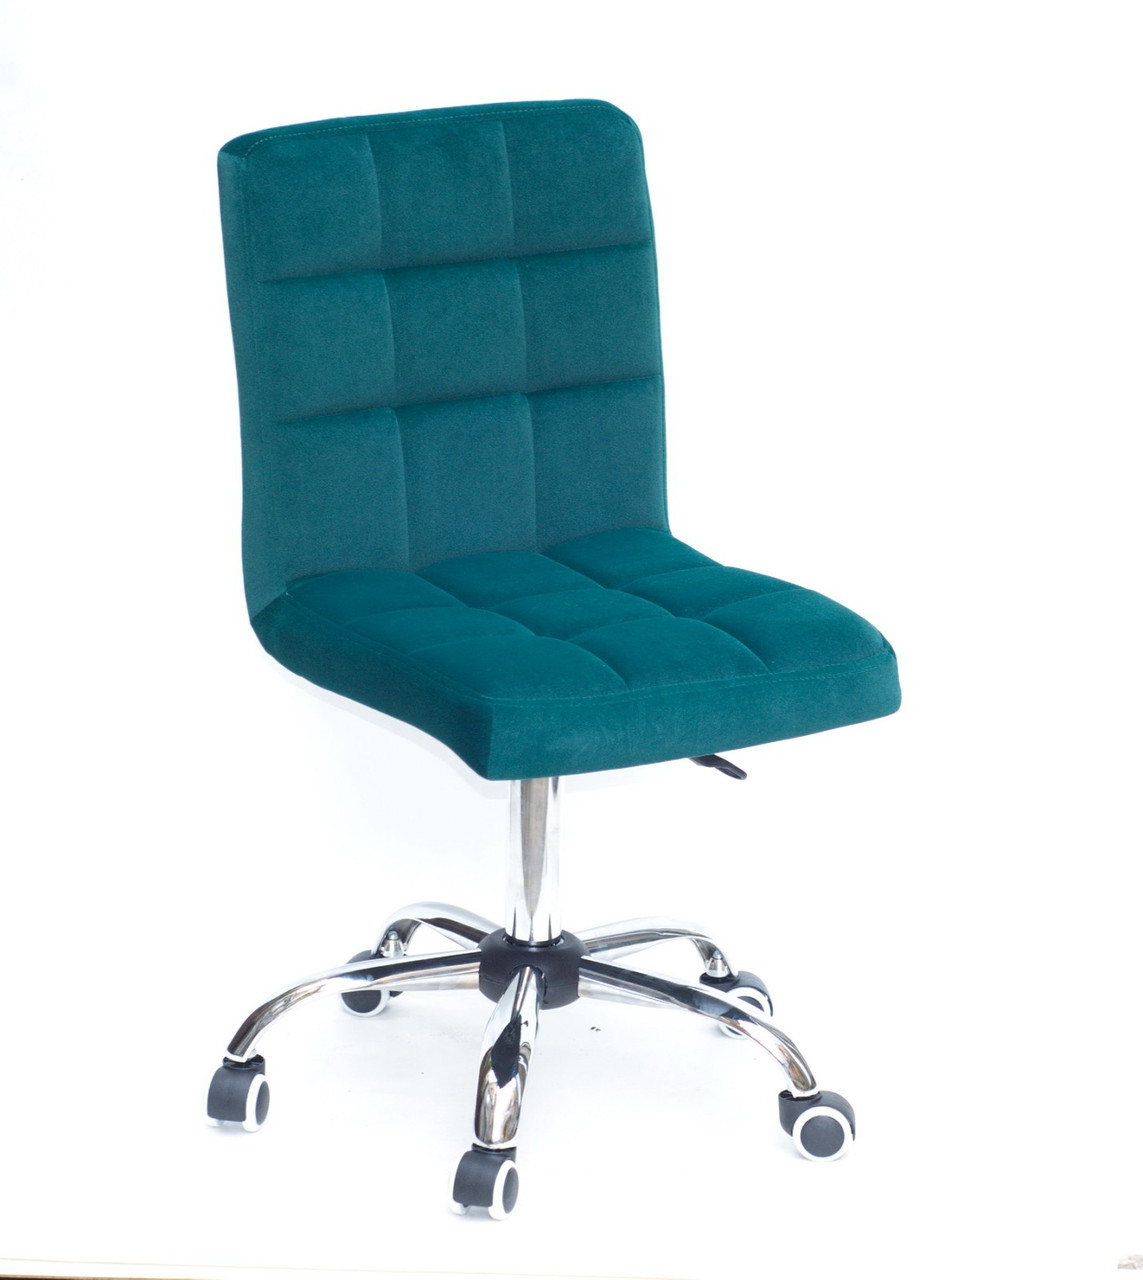 Кресло офисное  на колесах  AUGUSTO  СН-OFFICE  бархат , ЗЕЛЕНЫЙ B-1003